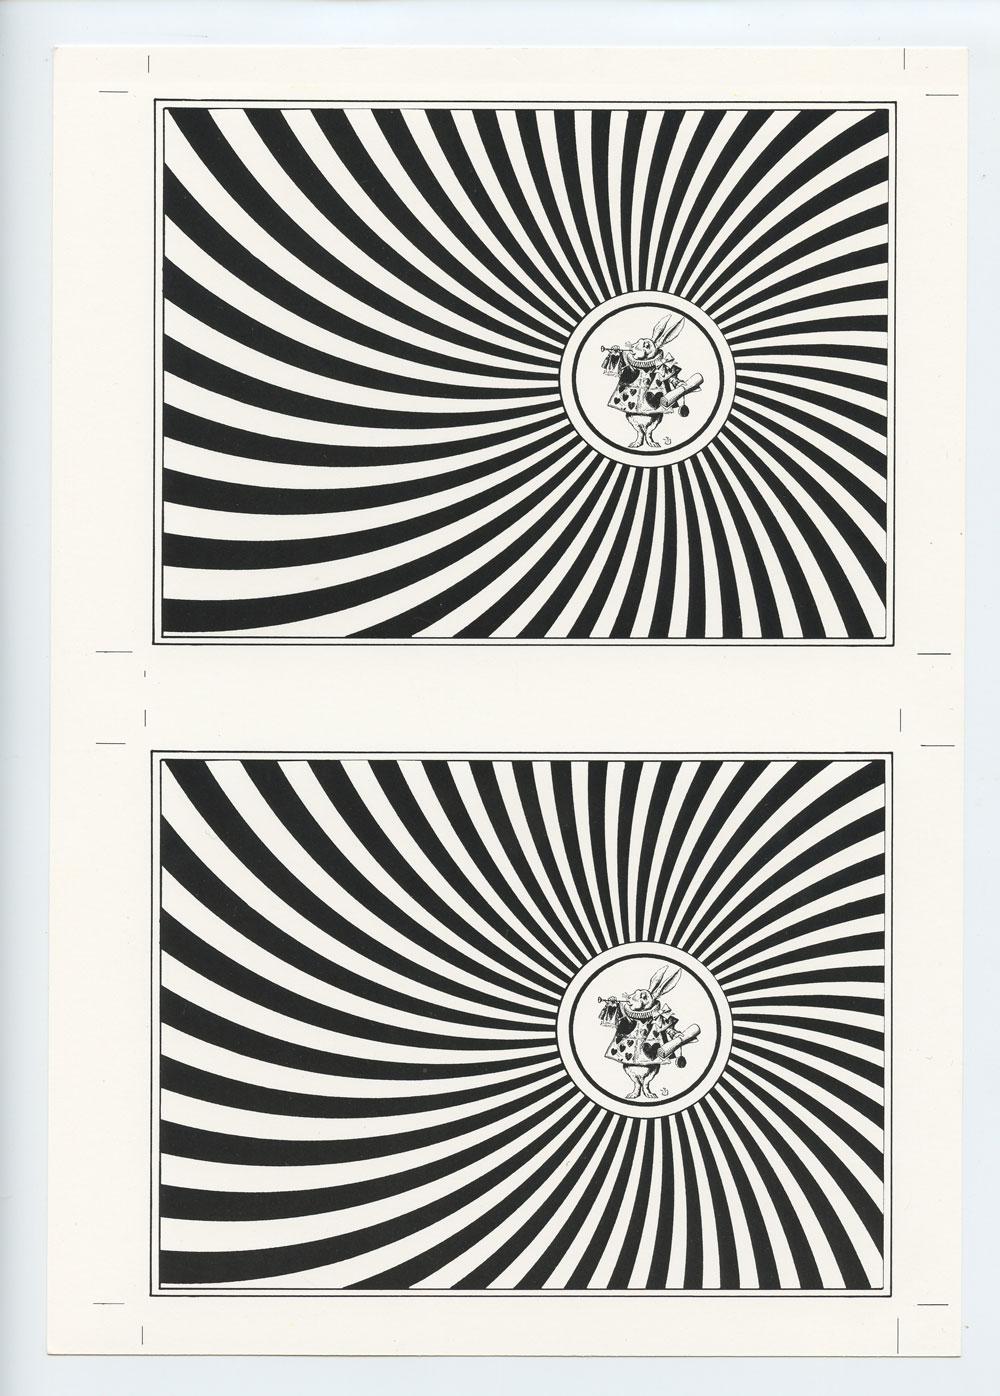 Blotter Acid Art Exhibit Reception Postcard Uncut Through The Looking Glass 1992